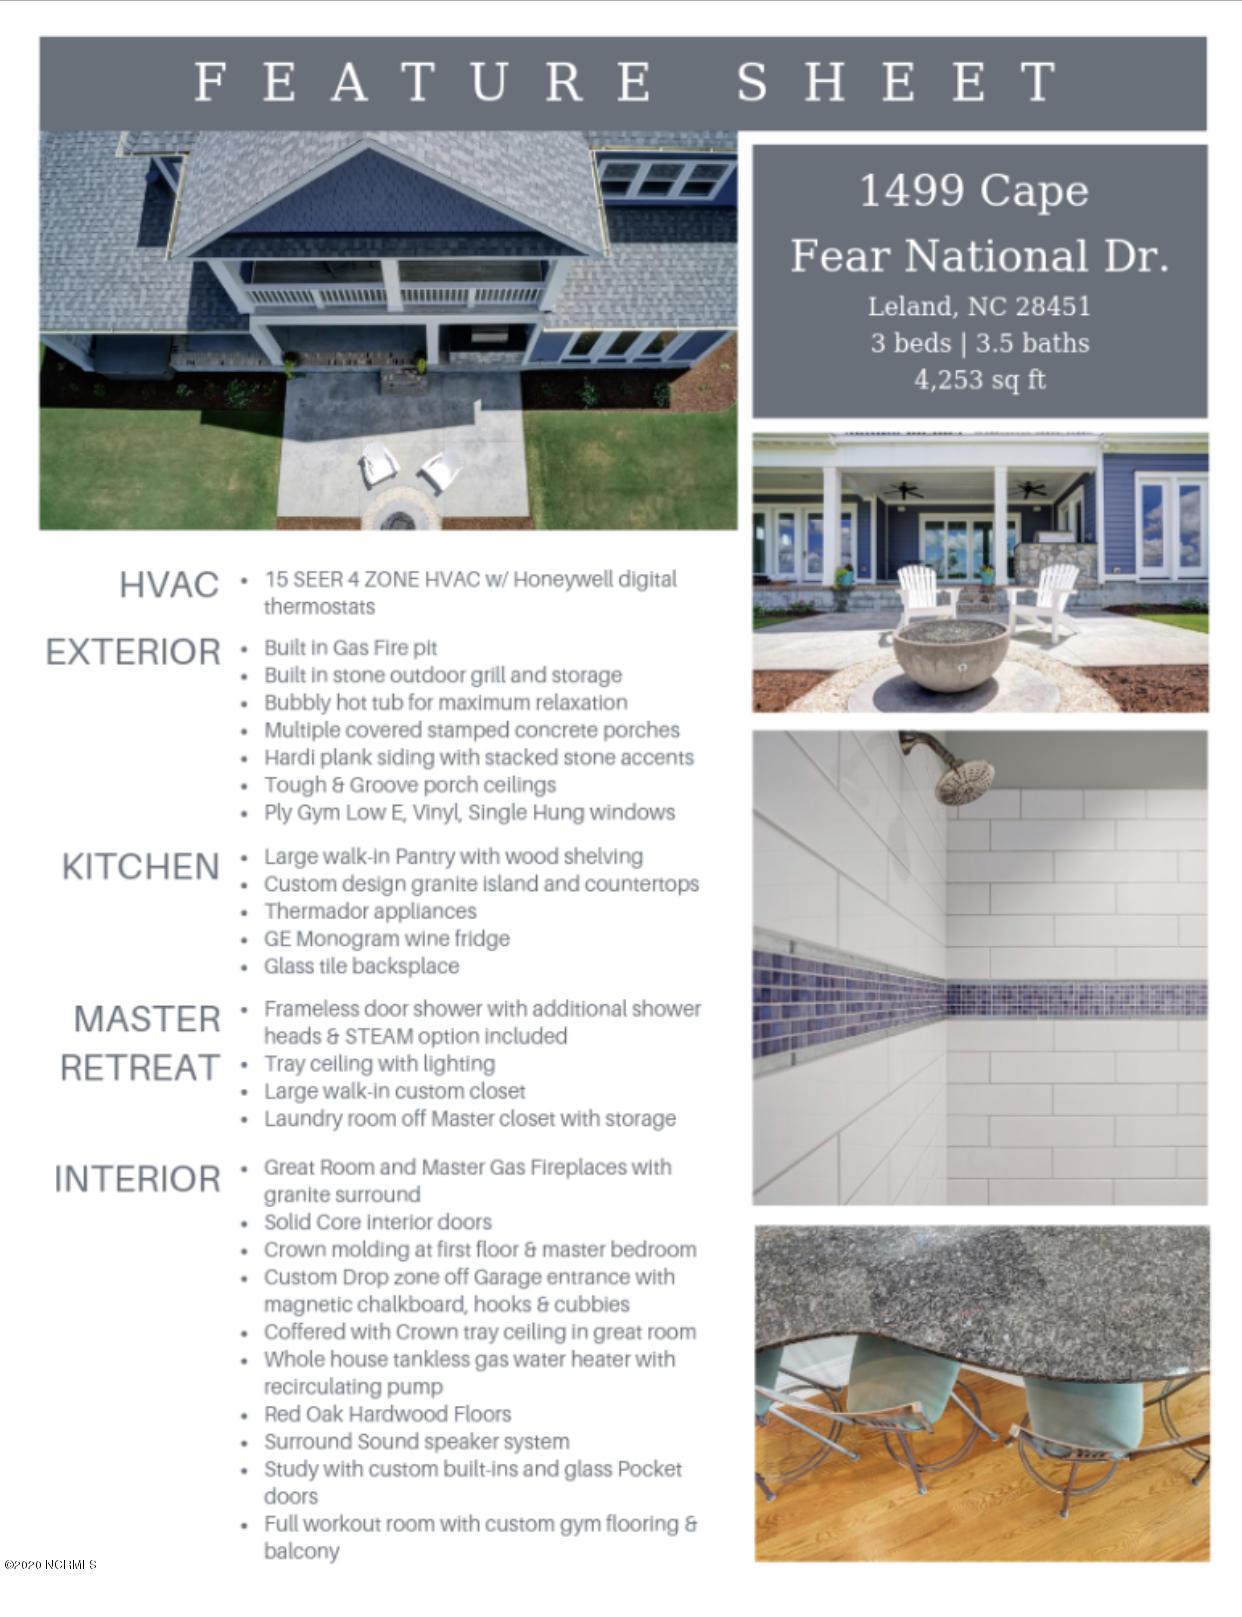 1499 Cape Fear National Drive Leland, NC 28451